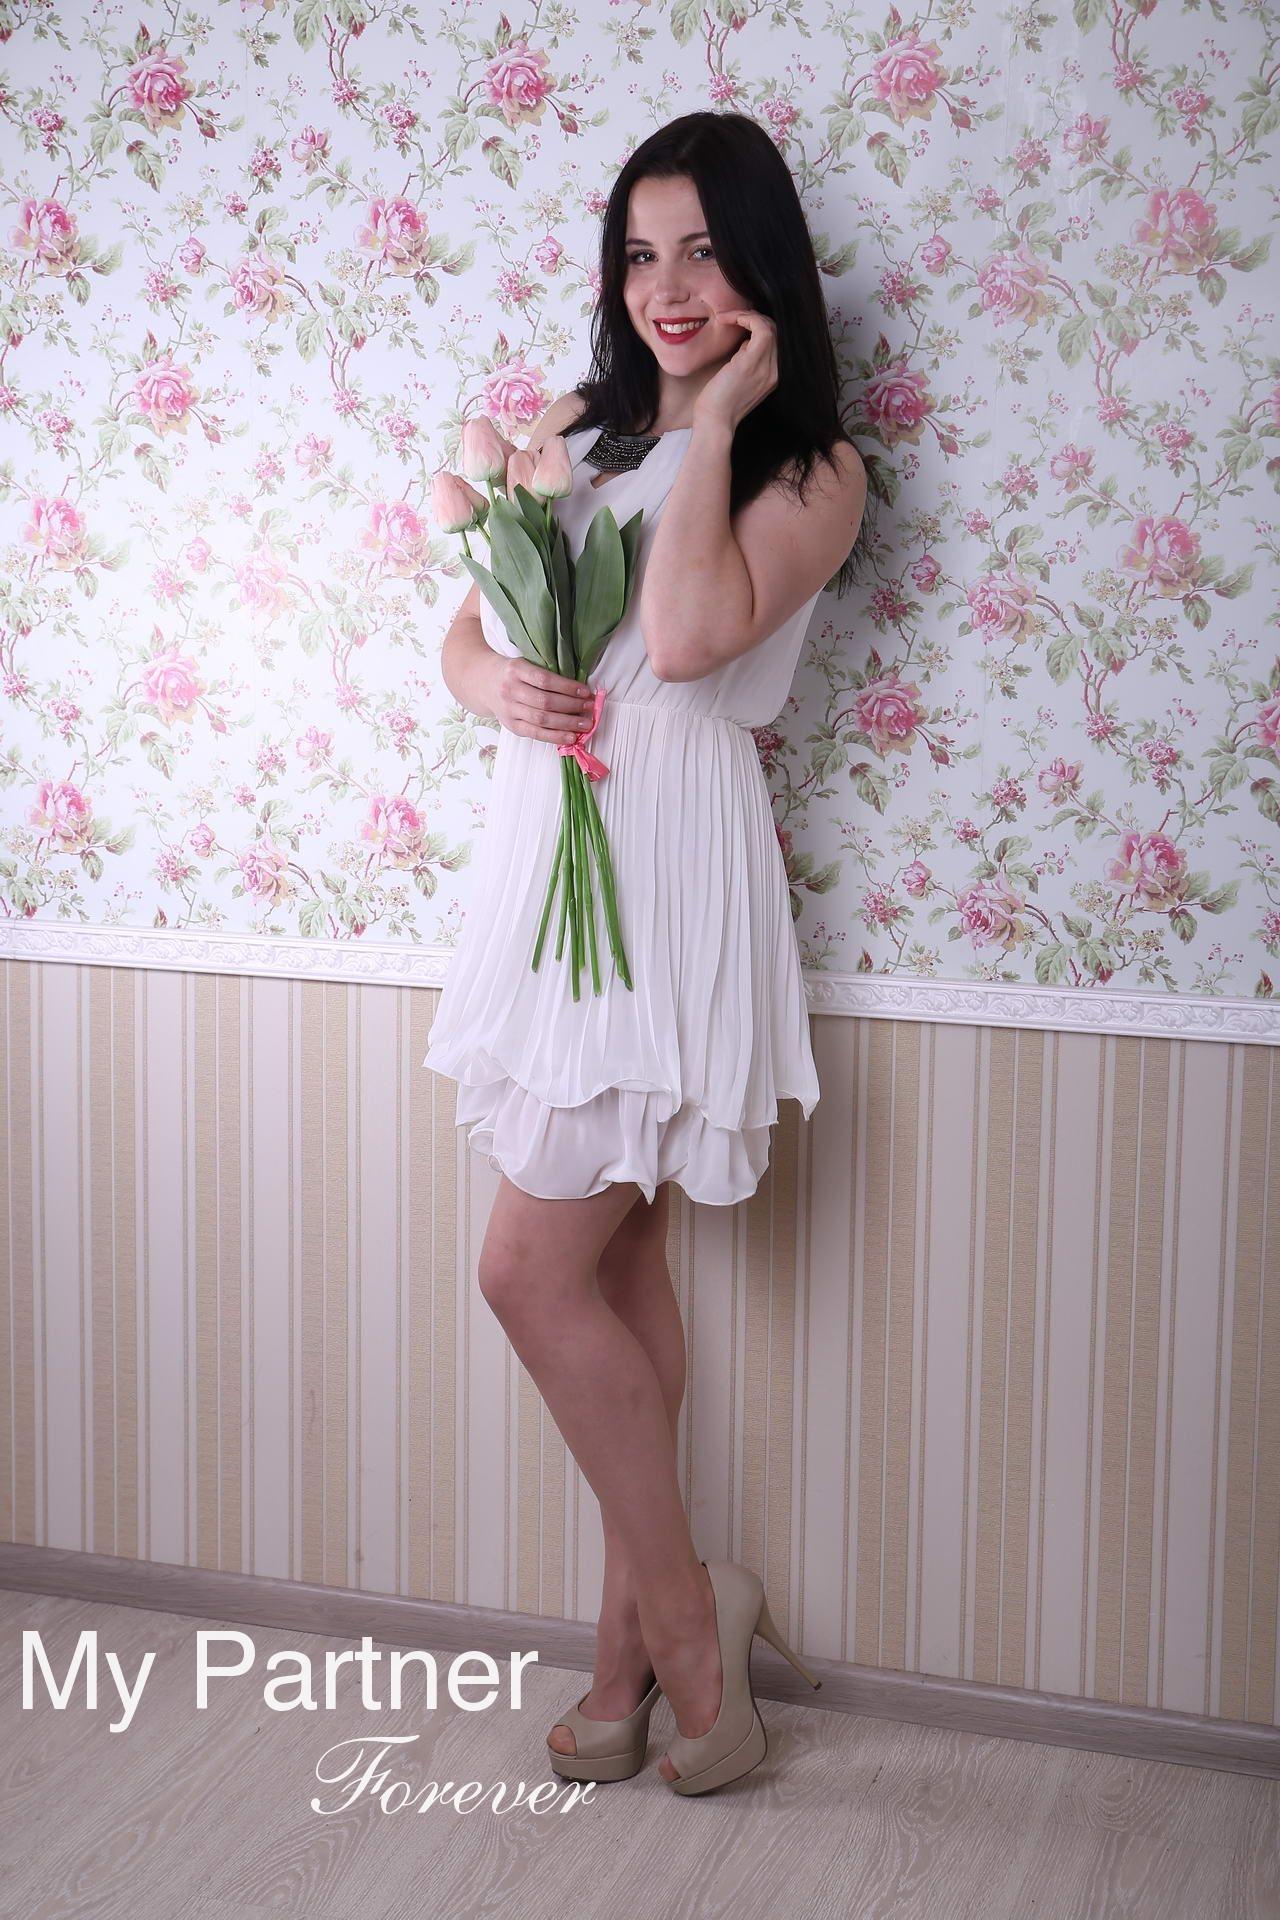 Gorgeous Bride from Ukraine - Alina from Vinnitsa, Ukraine